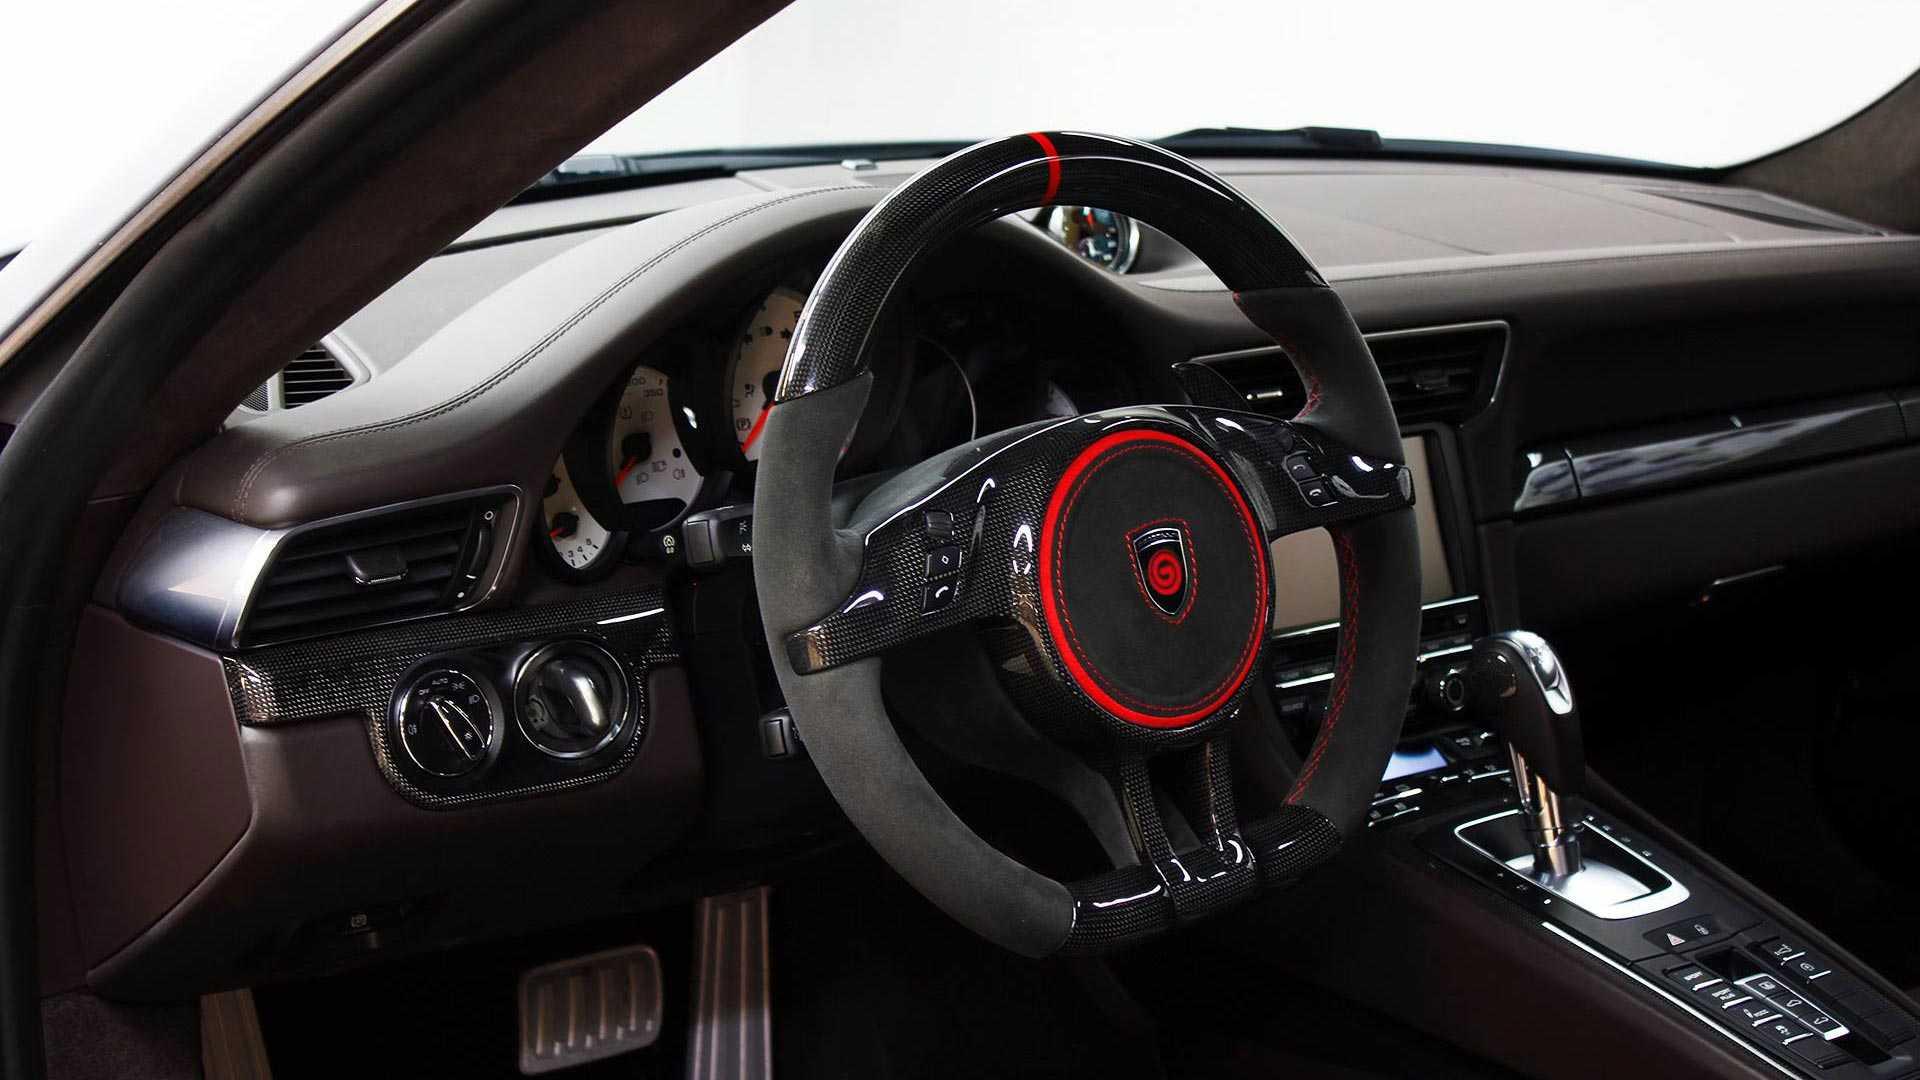 porsche-911-turbo-gemballa-gtr-8xx-evo-r (5)